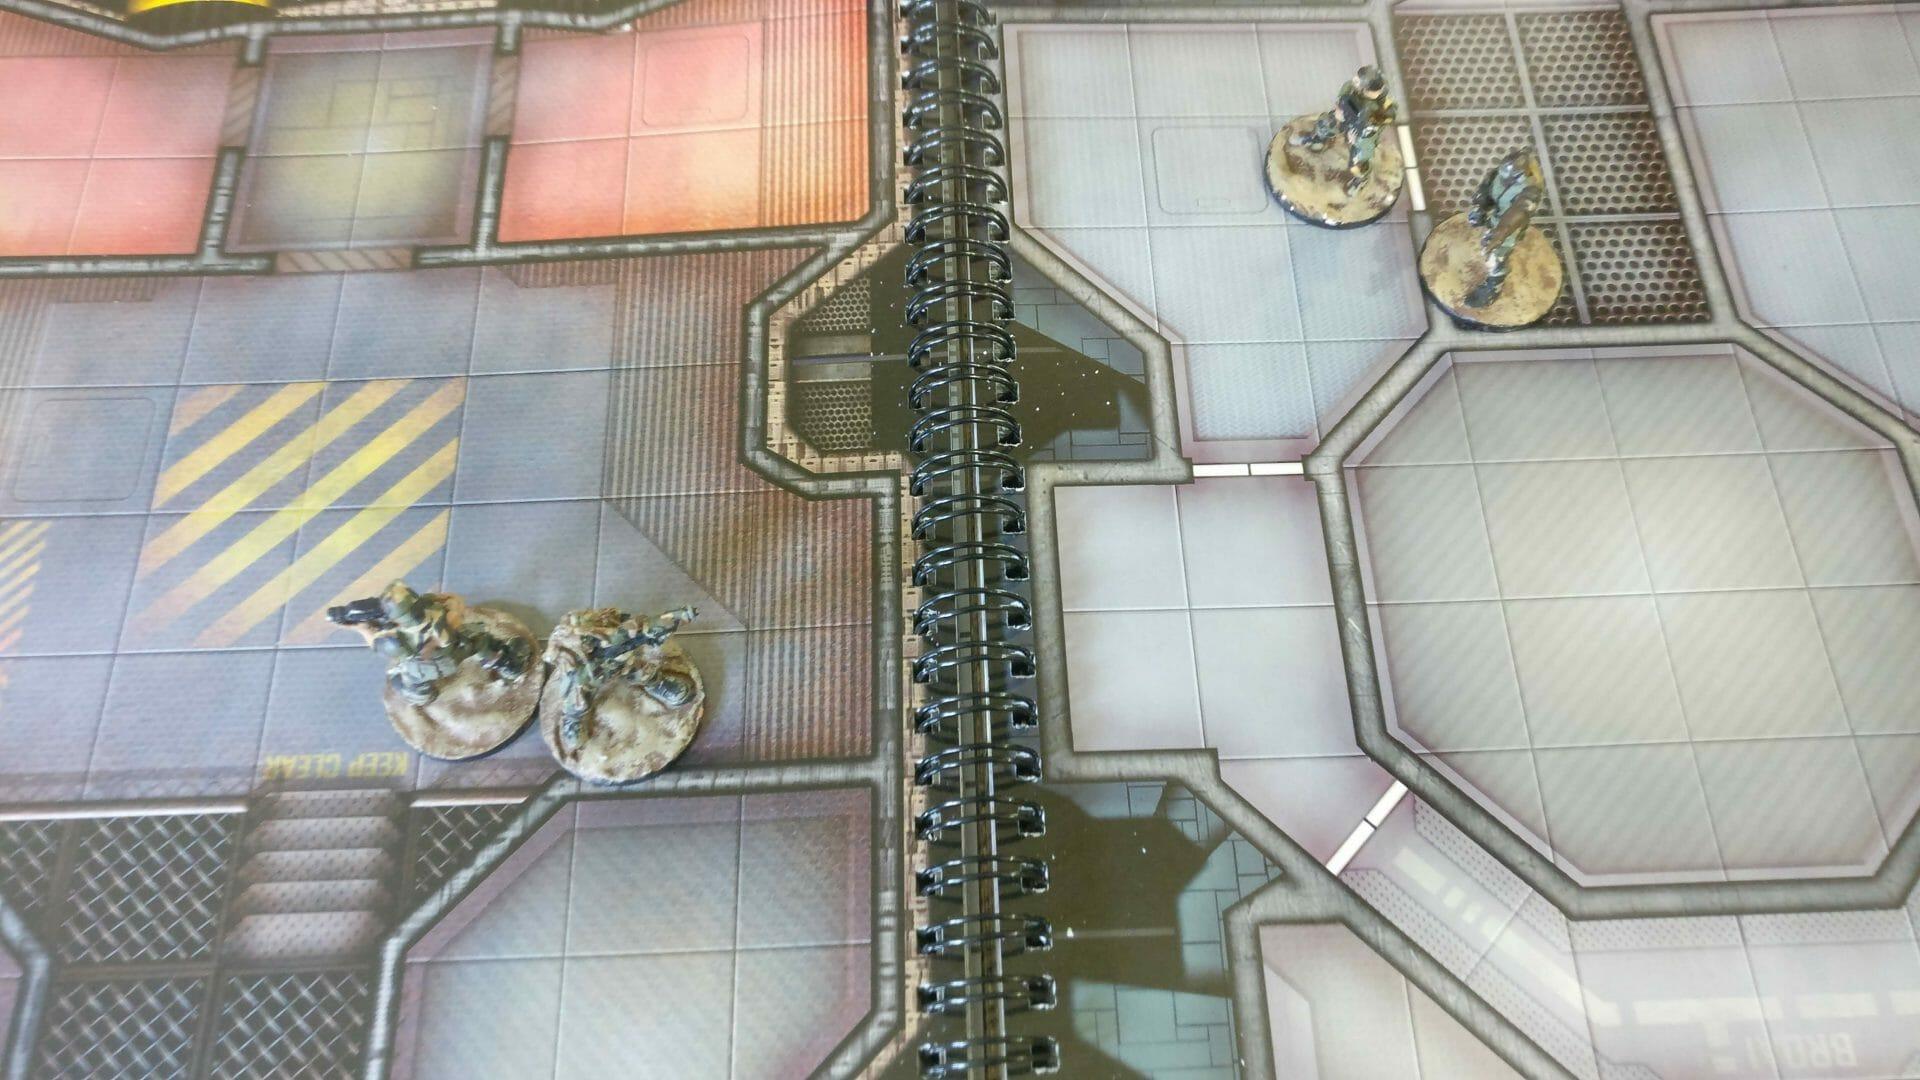 sci-fi gaming mat